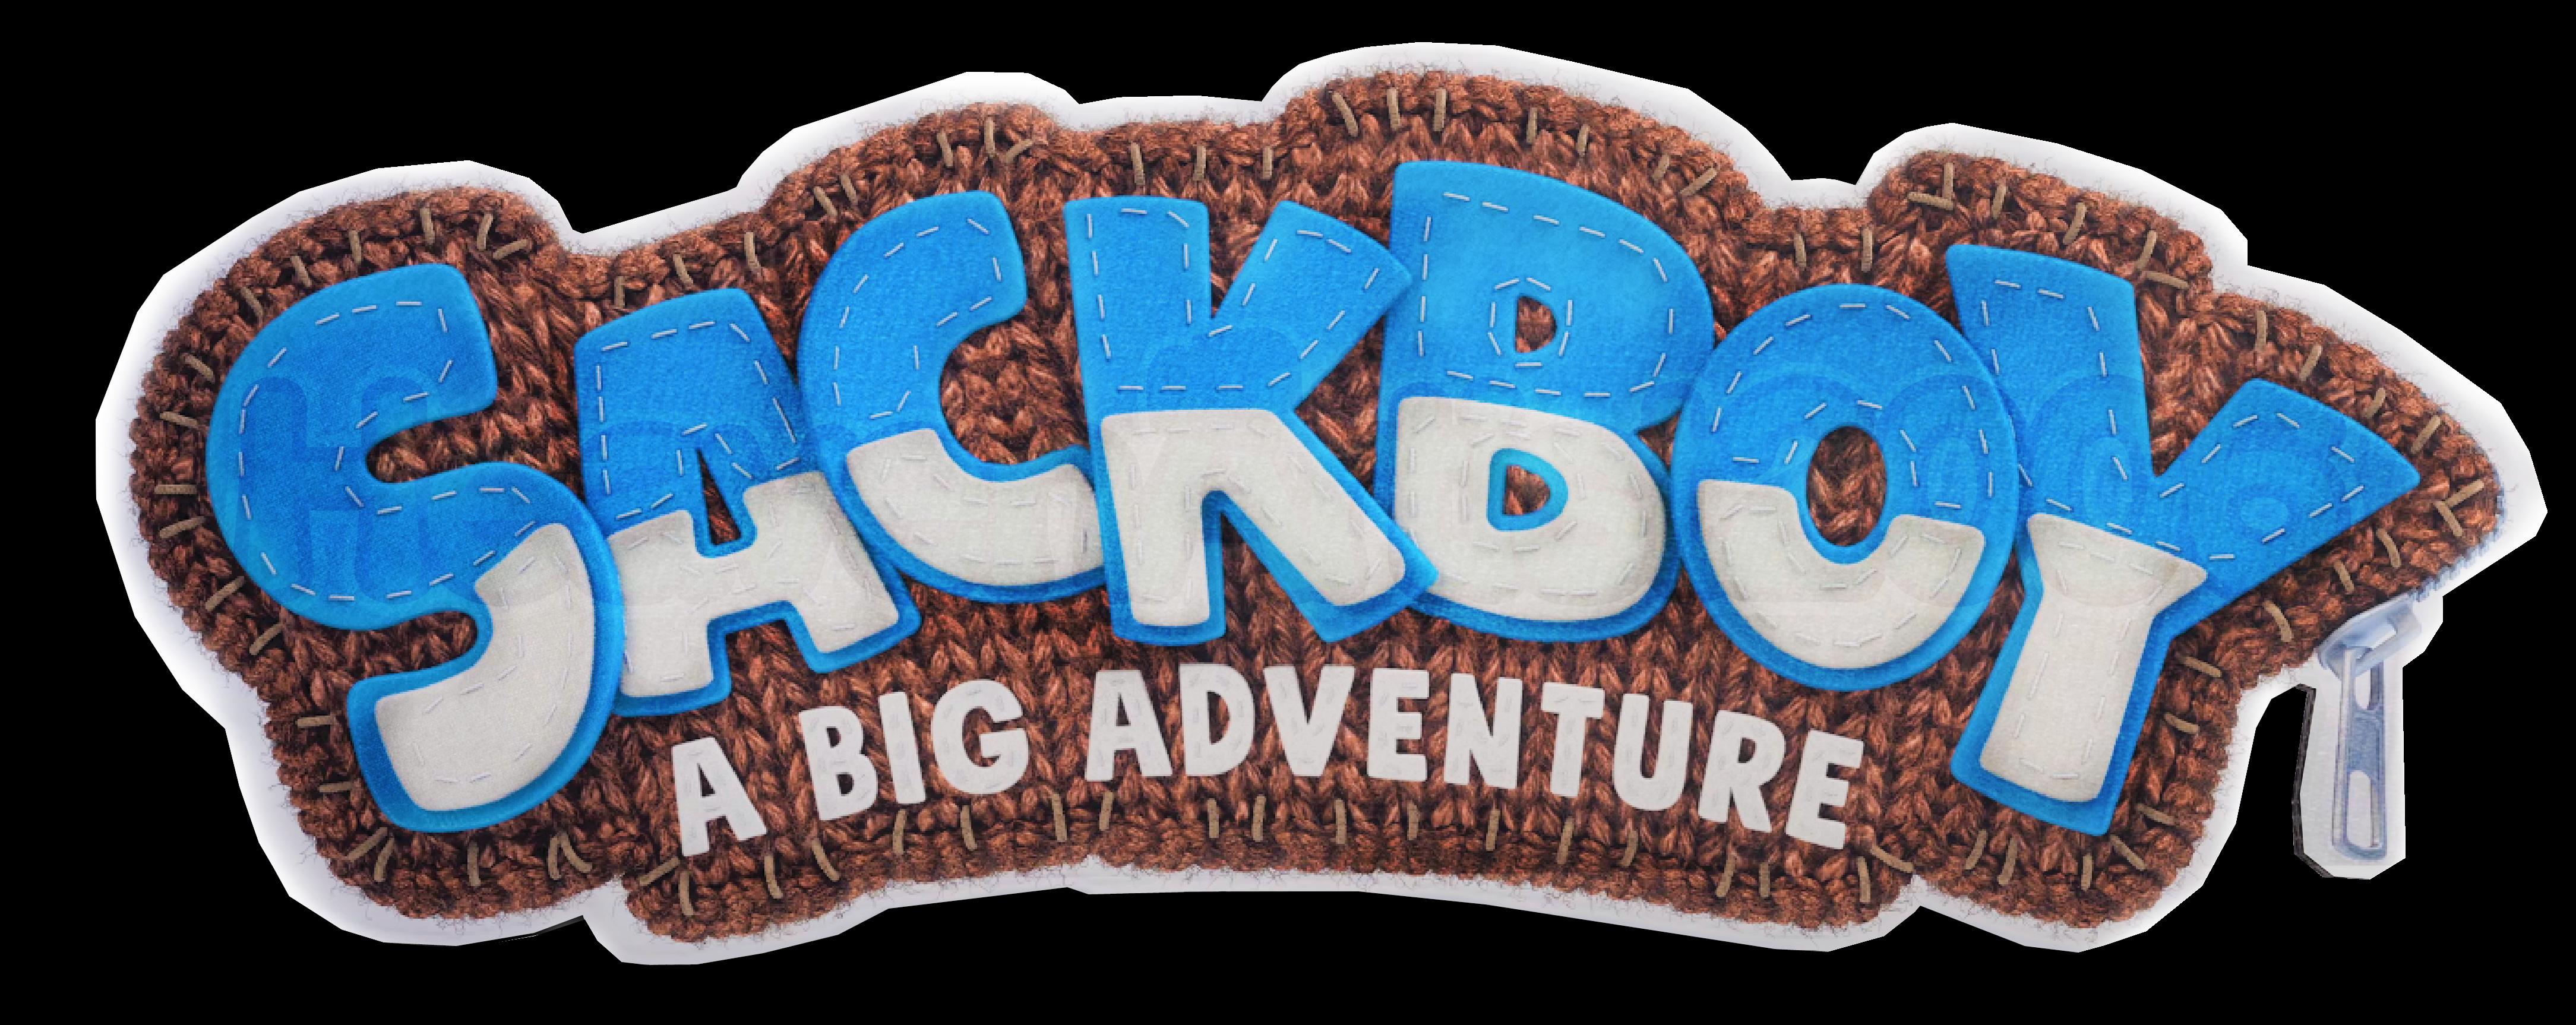 SackBoy: A Big Adventure. Beta Logo by heavenartist2006 on DeviantArt